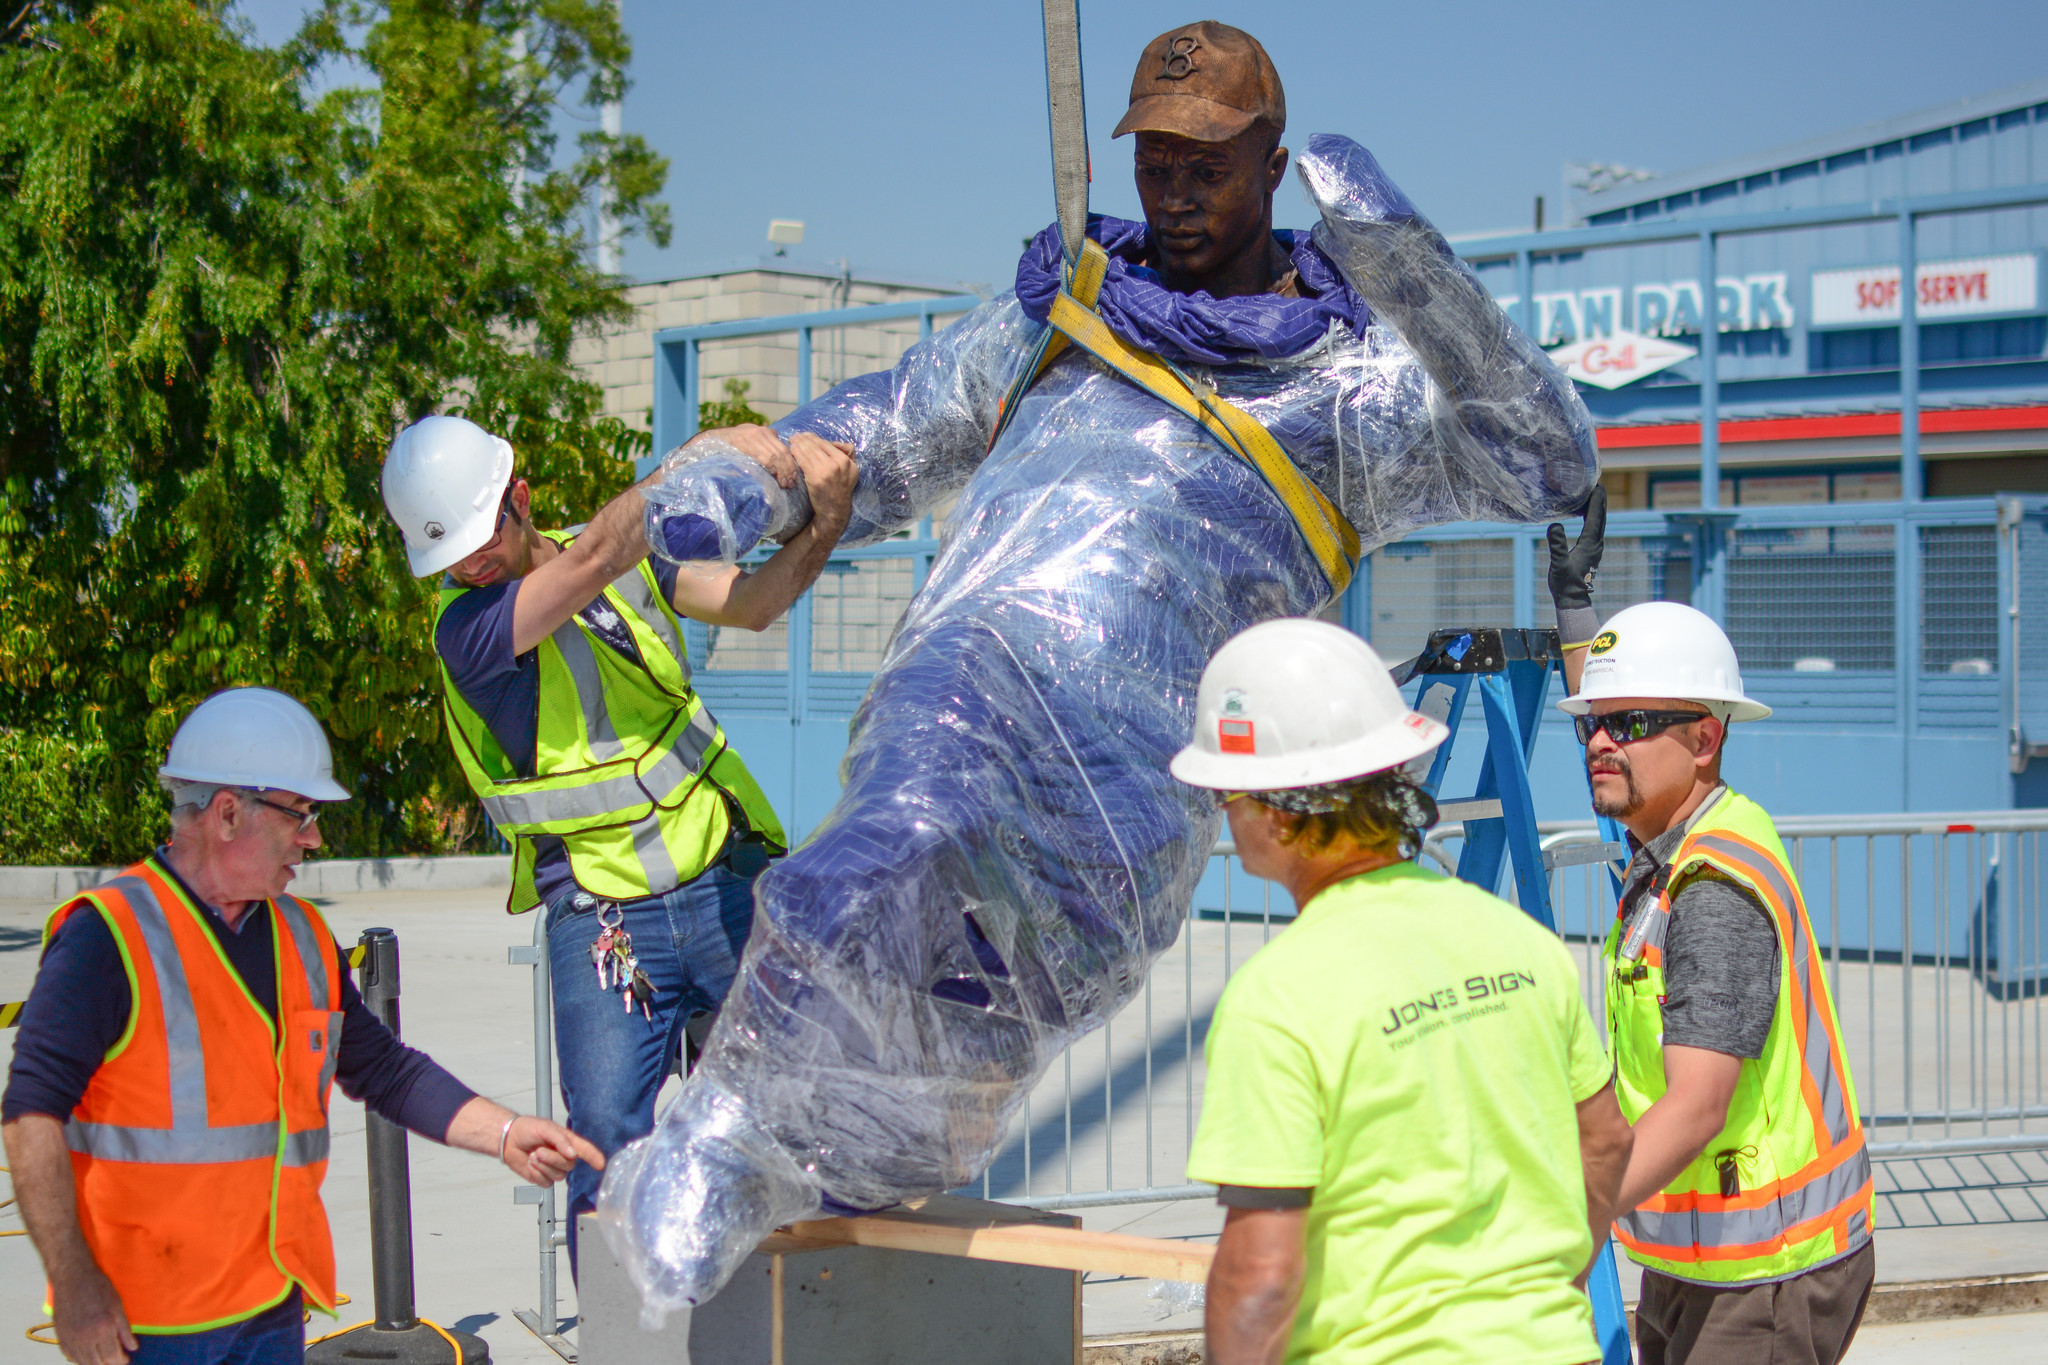 Dodgers to unveil Jackie Robinson statue Saturday - LA Times